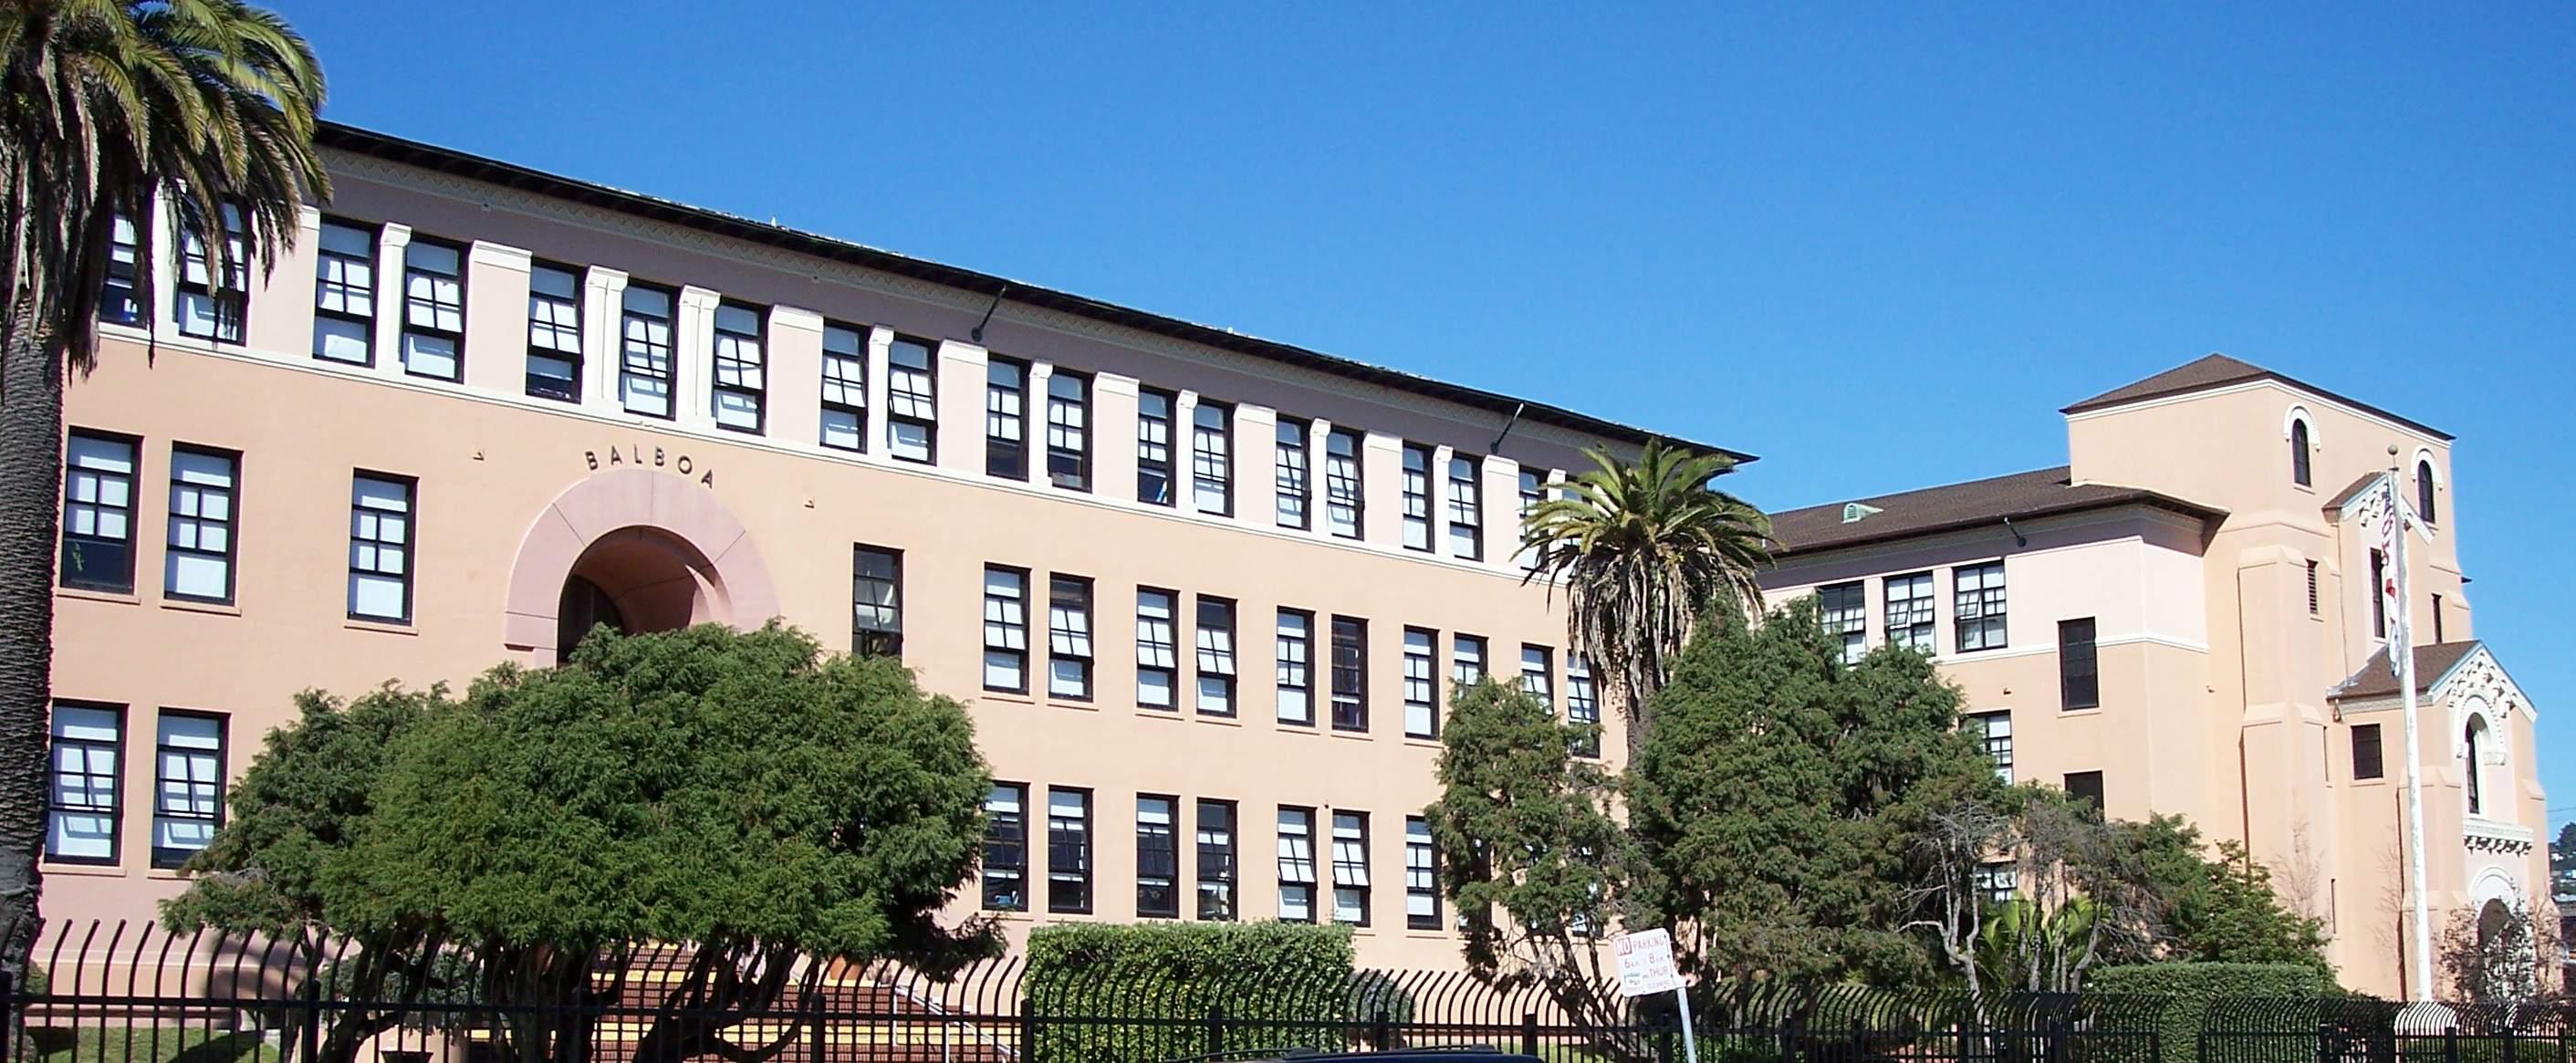 File:Balboa-HS-SanFrancisco-1.jpg - Wikipedia, the free encyclopedia